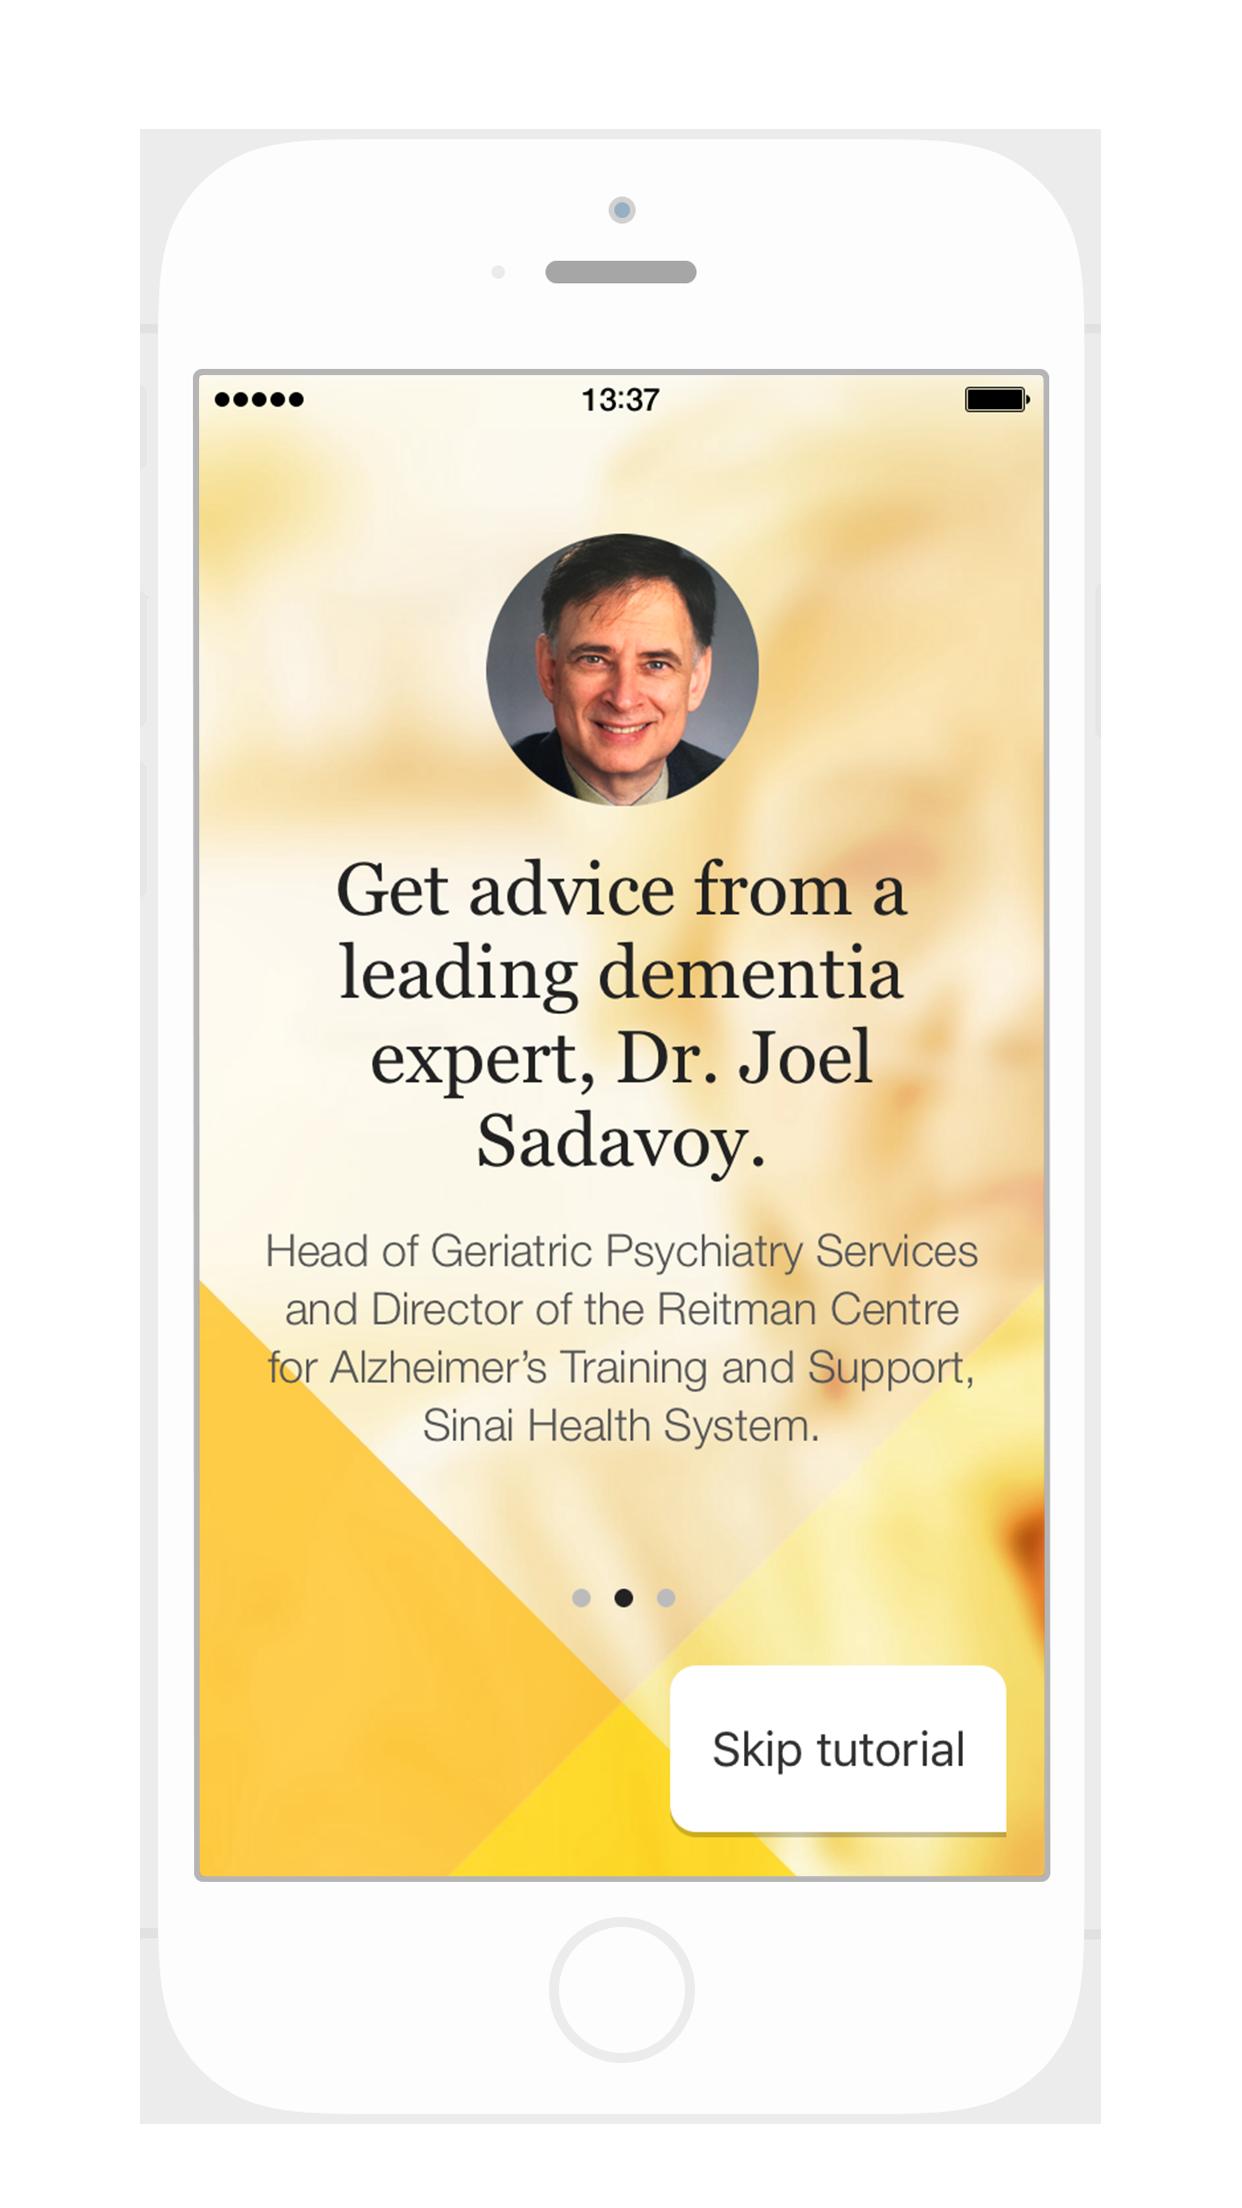 Dementia Advisor app screenshot, Get advice from a leading dementia expert, Dr. Joel Sadavoy